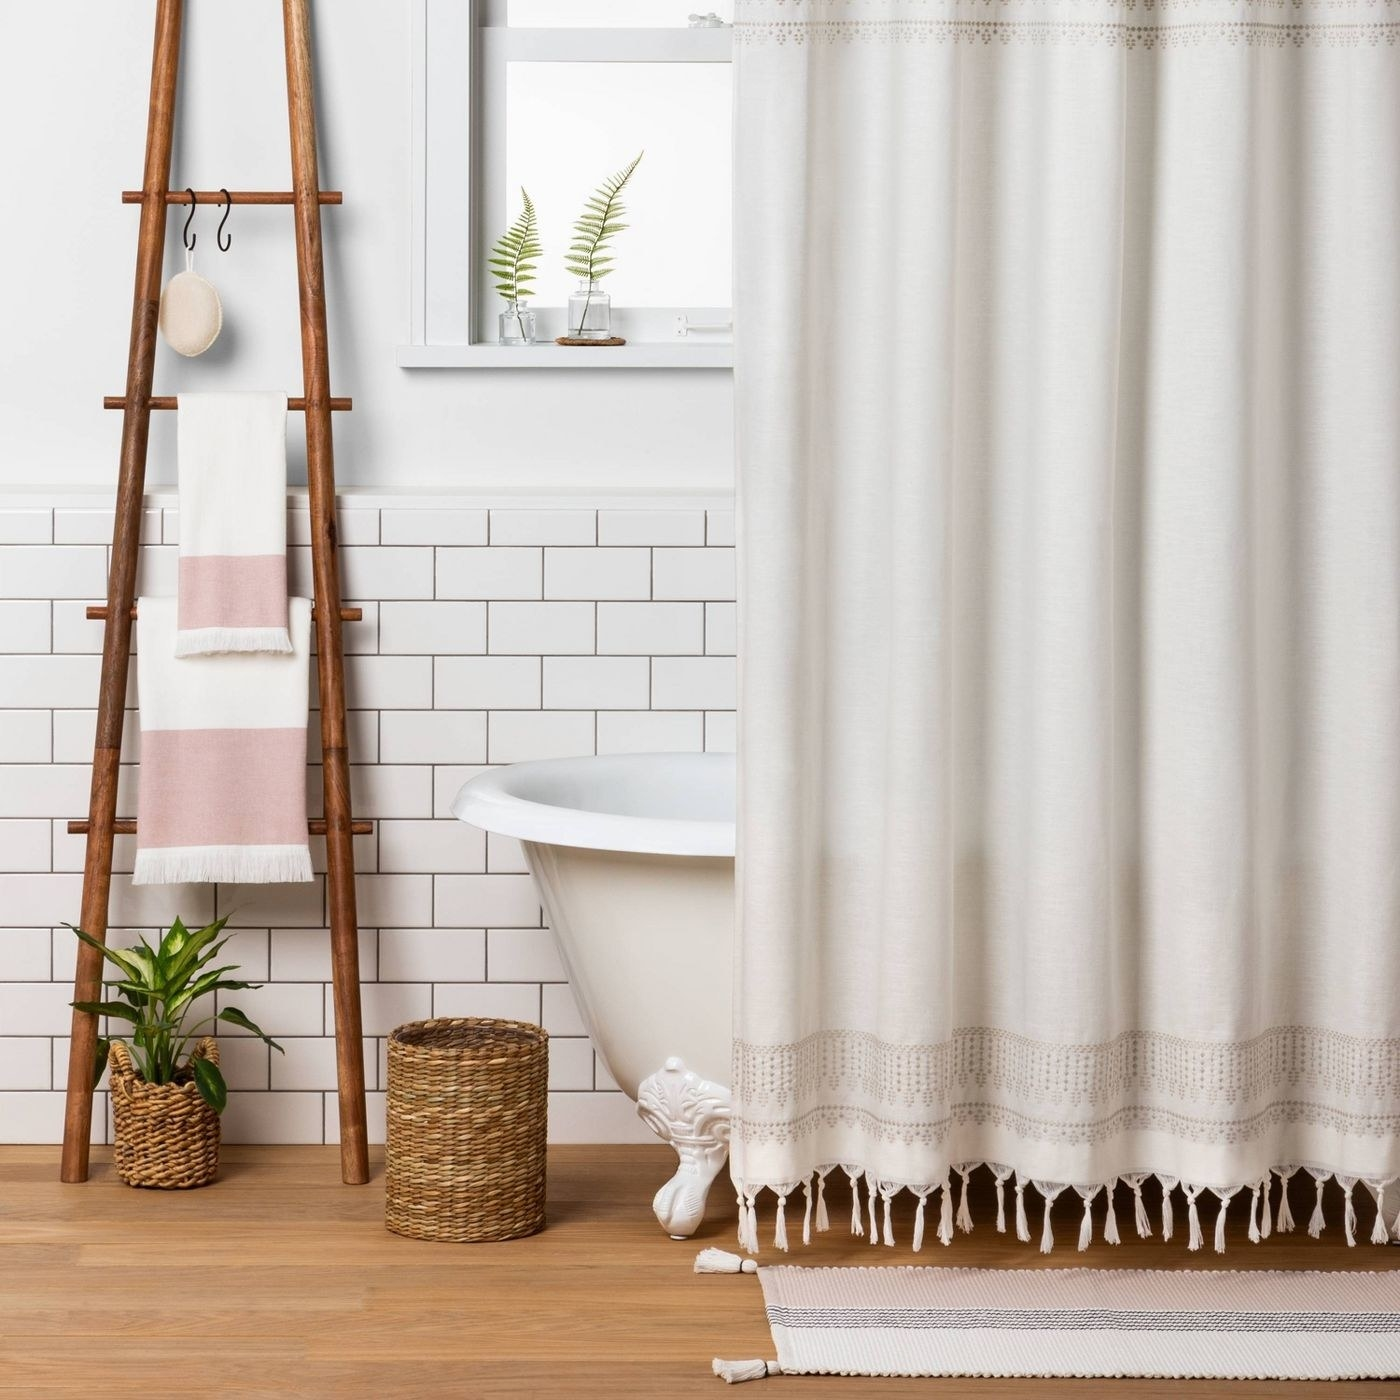 The decorative wood ladder